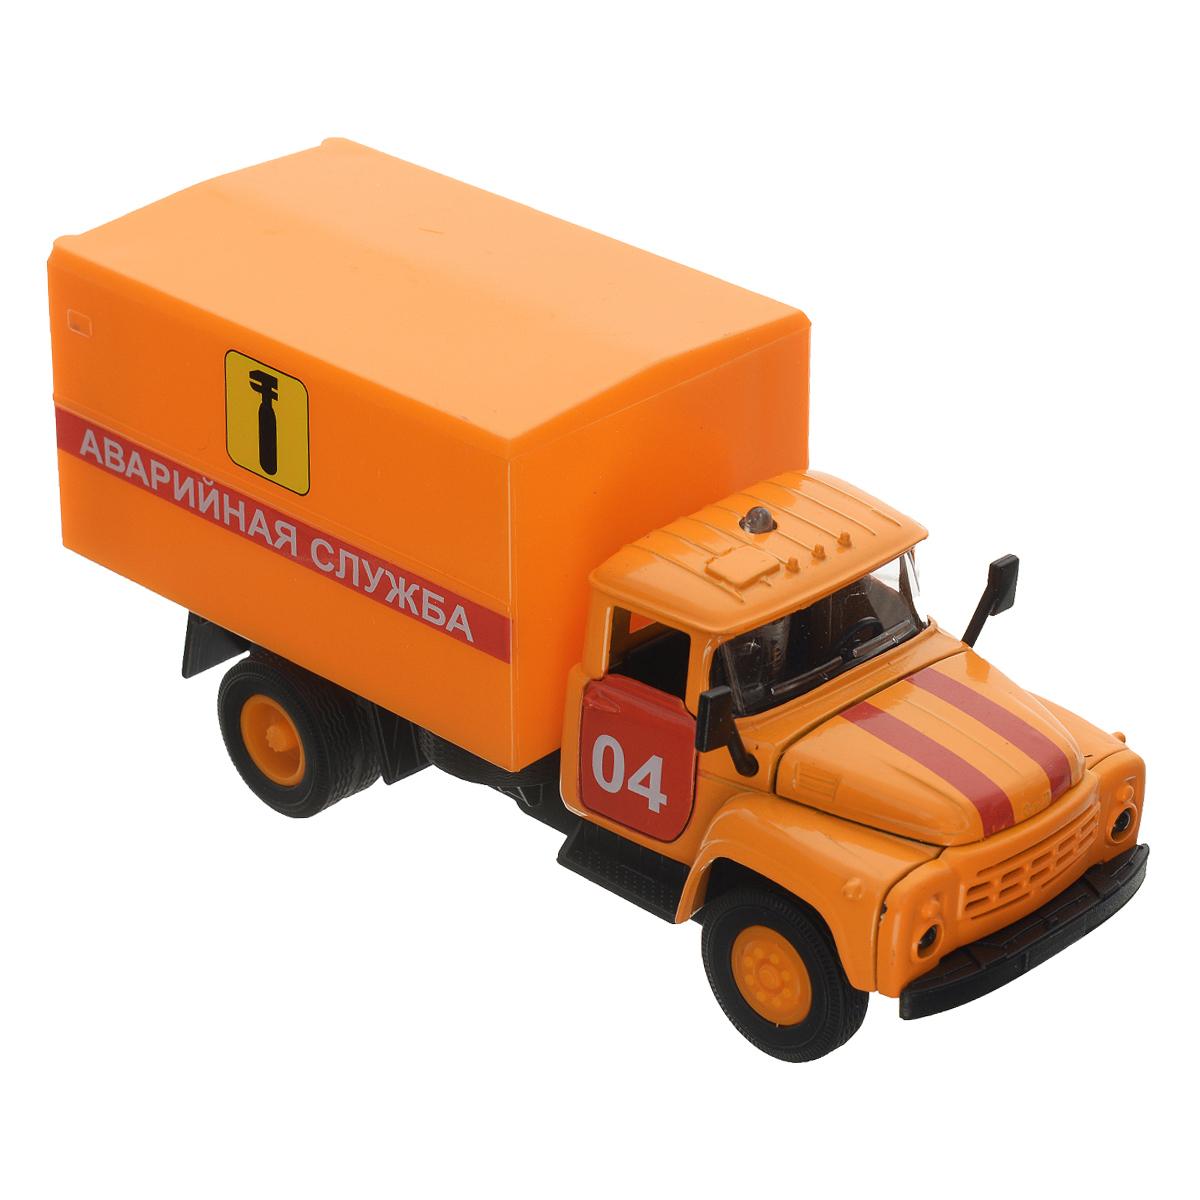 ТехноПарк Машинка инерционная ЗИЛ 130 Аварийная служба игрушка технопарк зил 130 бензовоз x600 h09131 r